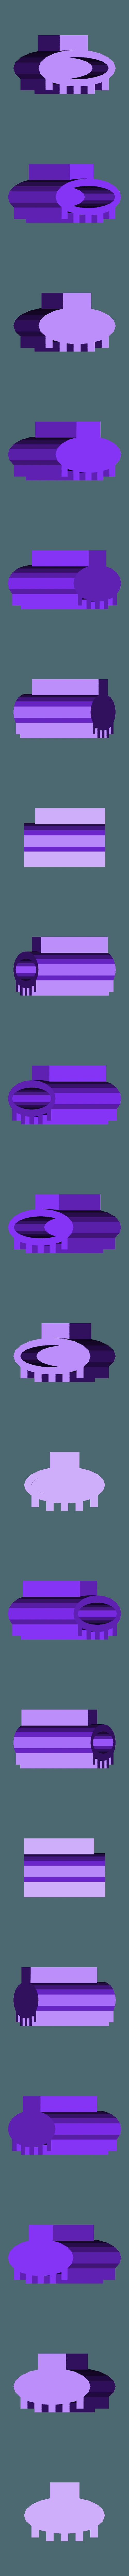 Ridged_Blower.stl Download free STL file Gaslands Greebles (Blowers and Burners) • Design to 3D print, Ellie_Valkyrie